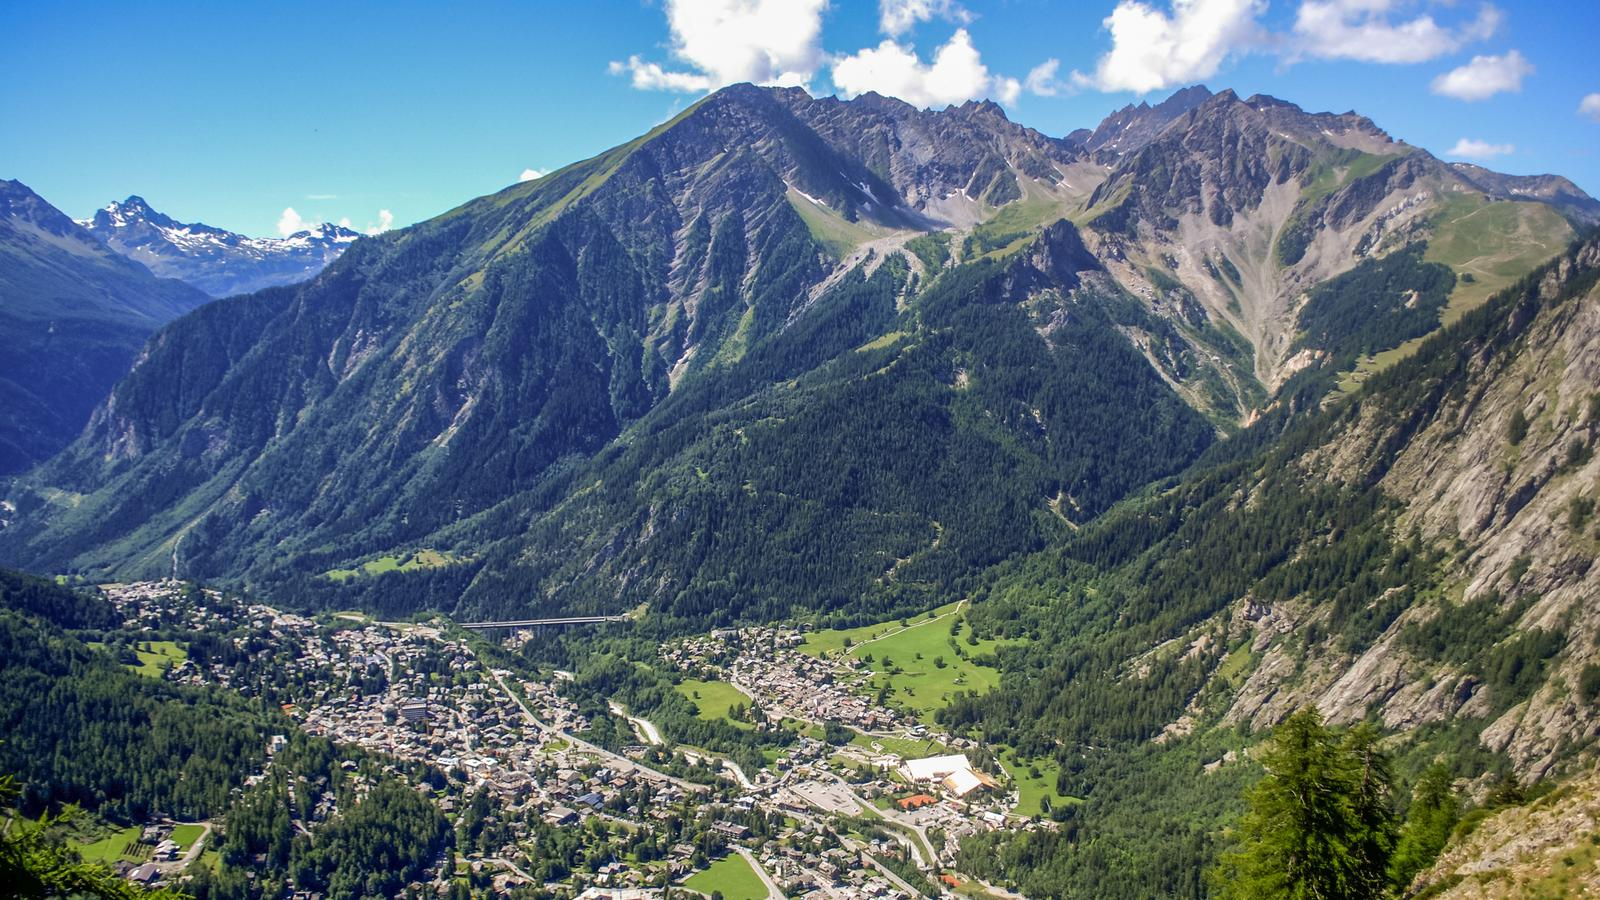 Albania Wallpaper Hd Trekking Mont Blanc In France Europe G Adventures